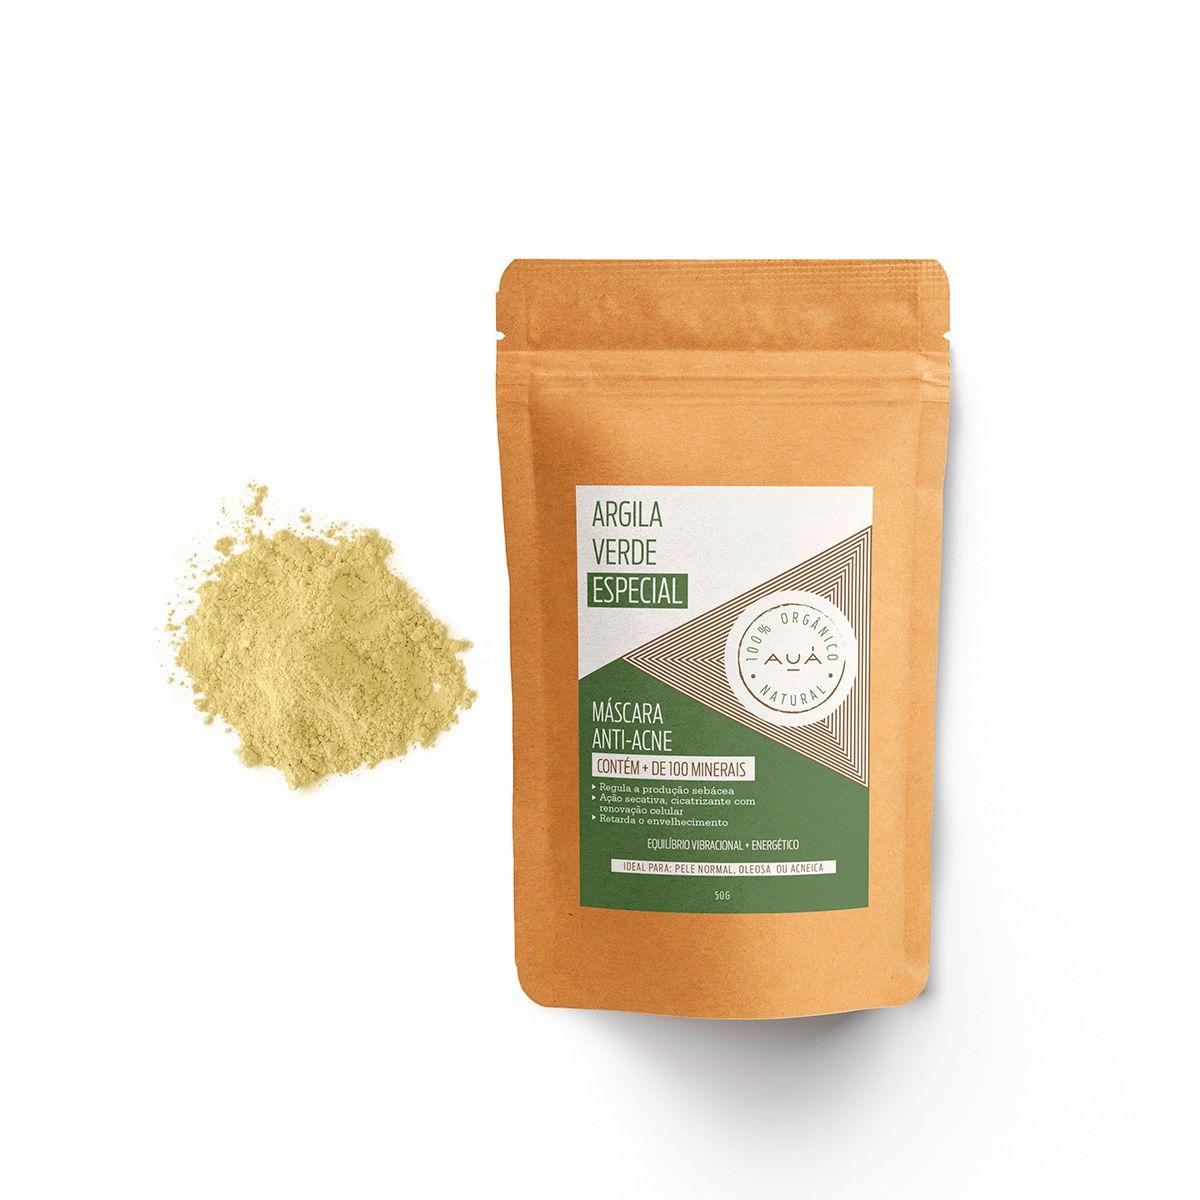 Kit Rejuvenesça + Esfoliante de Carnaúba + Argila Verde